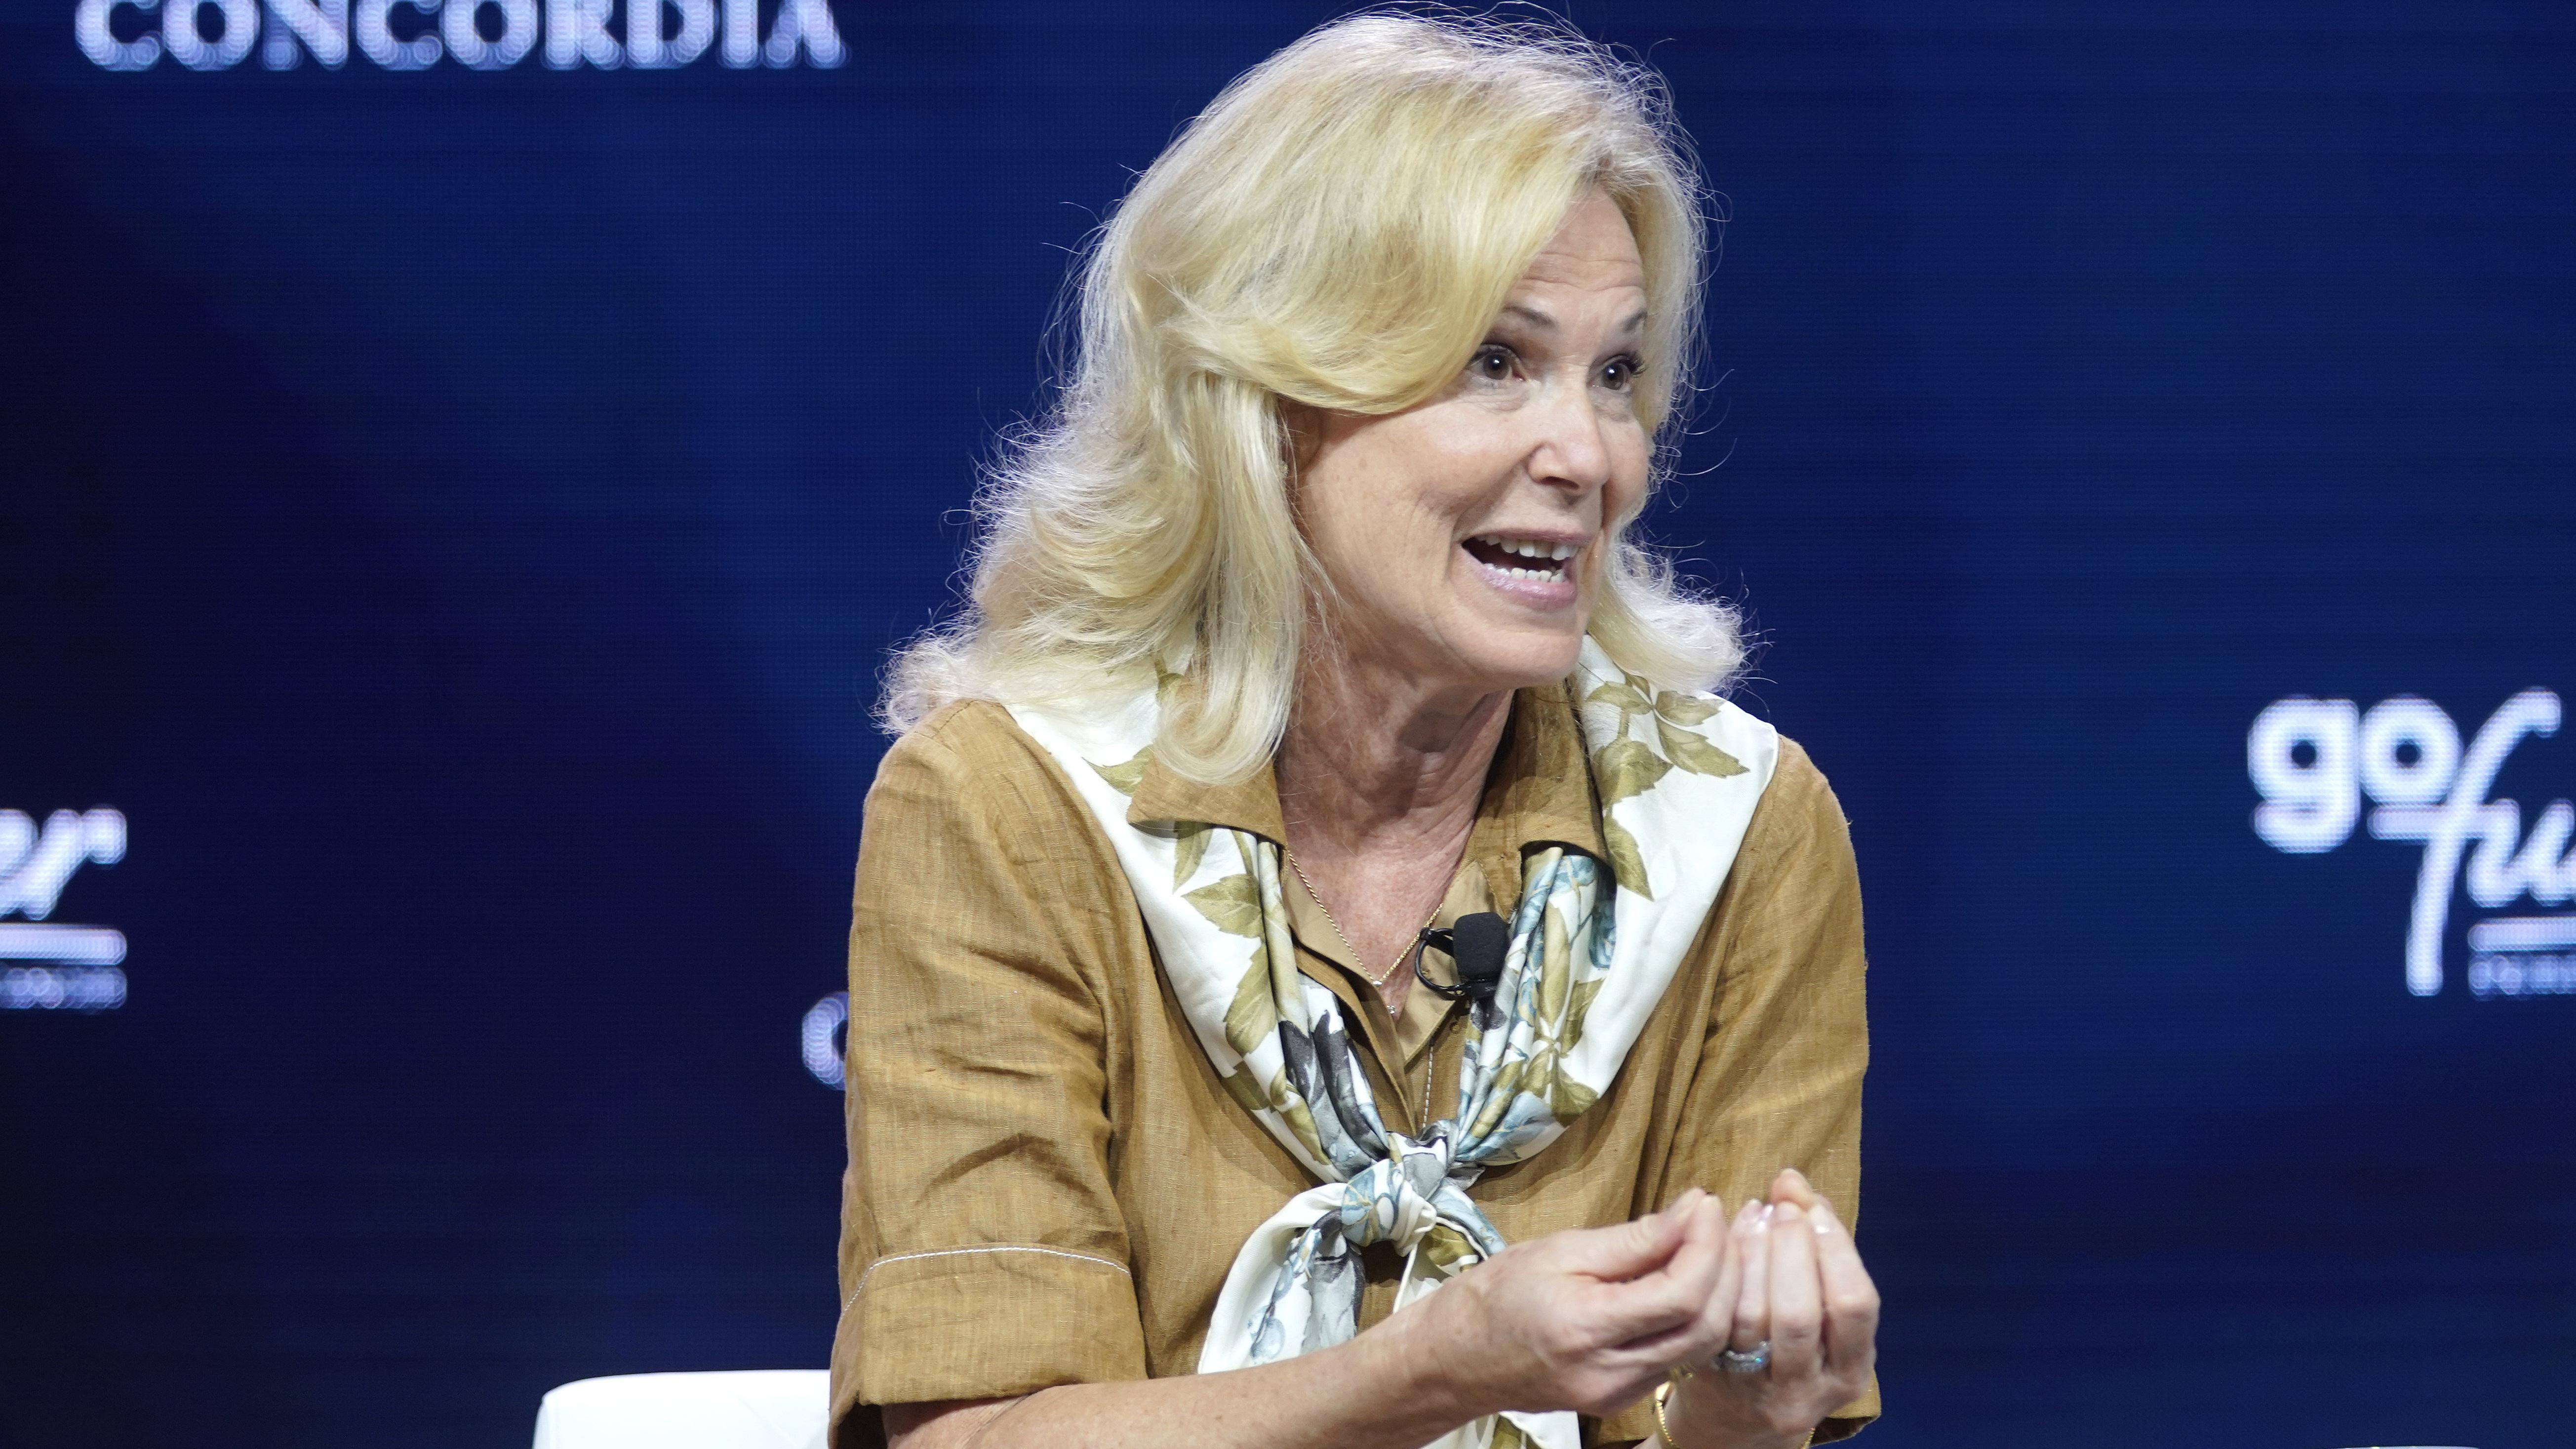 White House Names AIDS Expert Debbie Birx To Help Lead Coronavirus Response